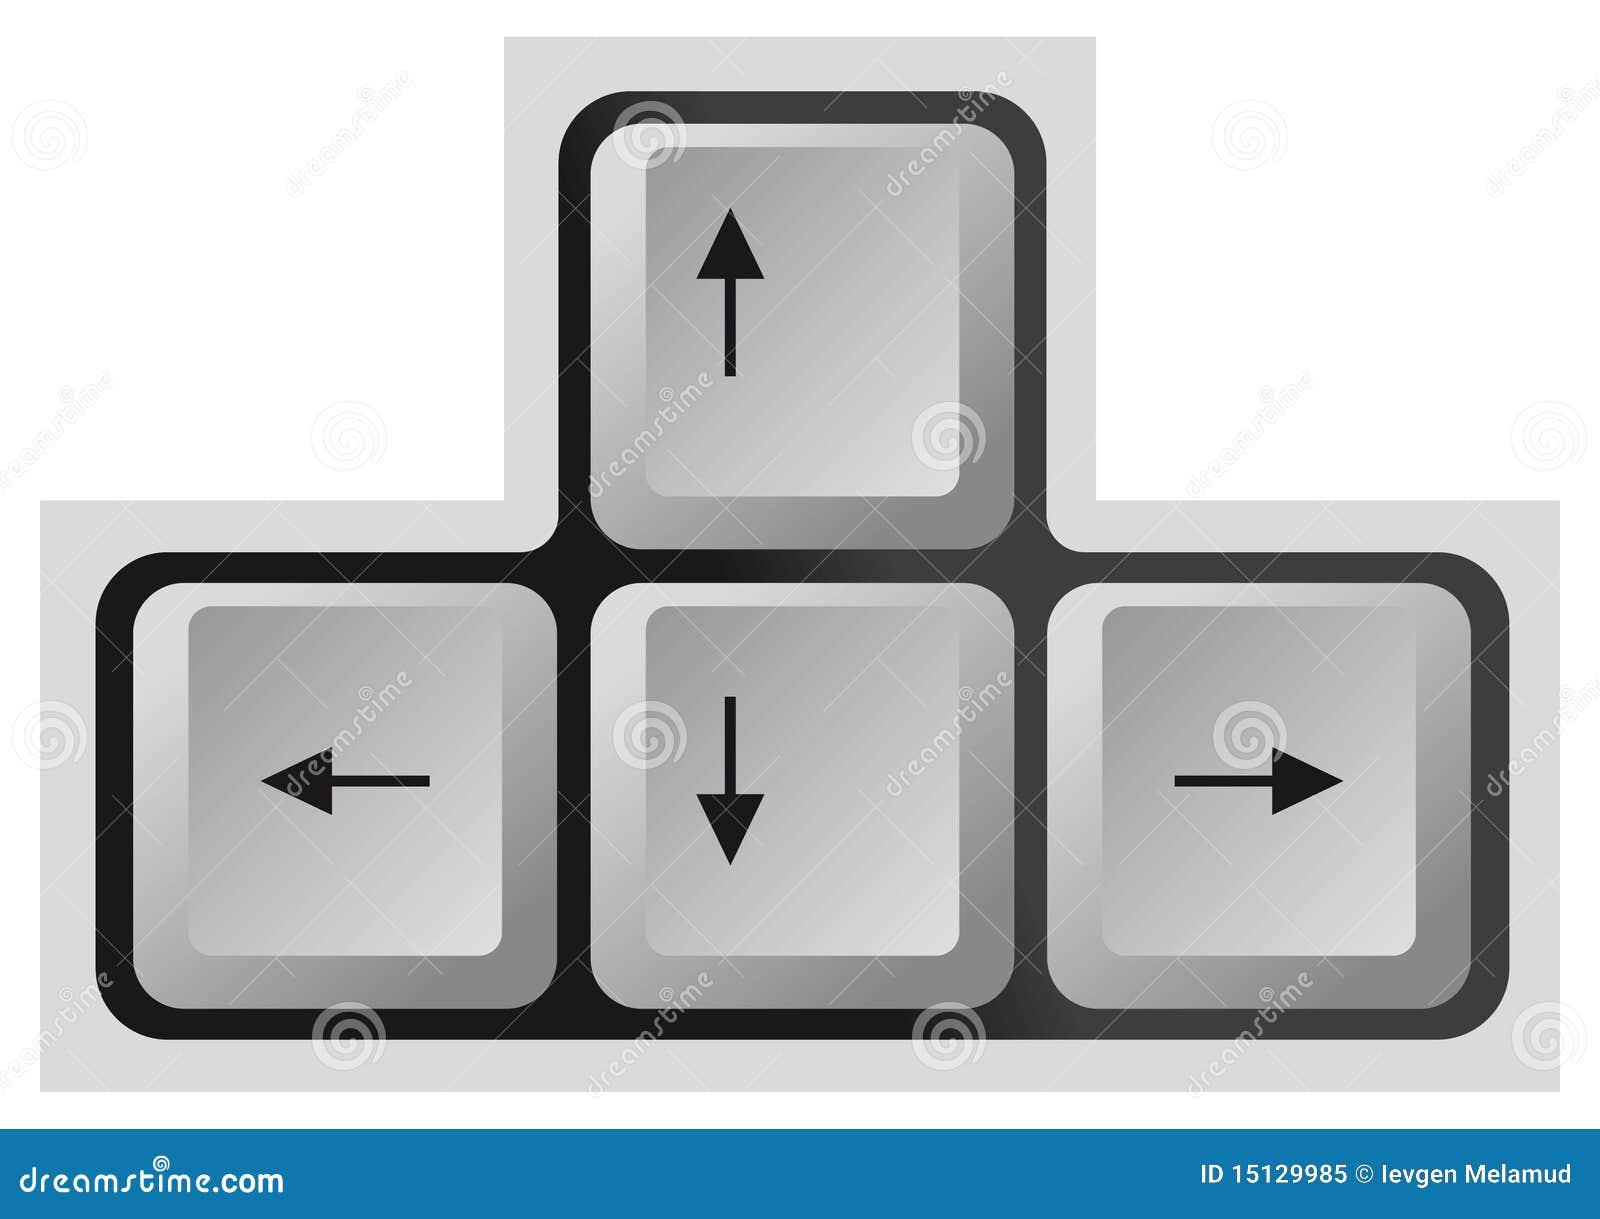 how to fix computer arrow keys